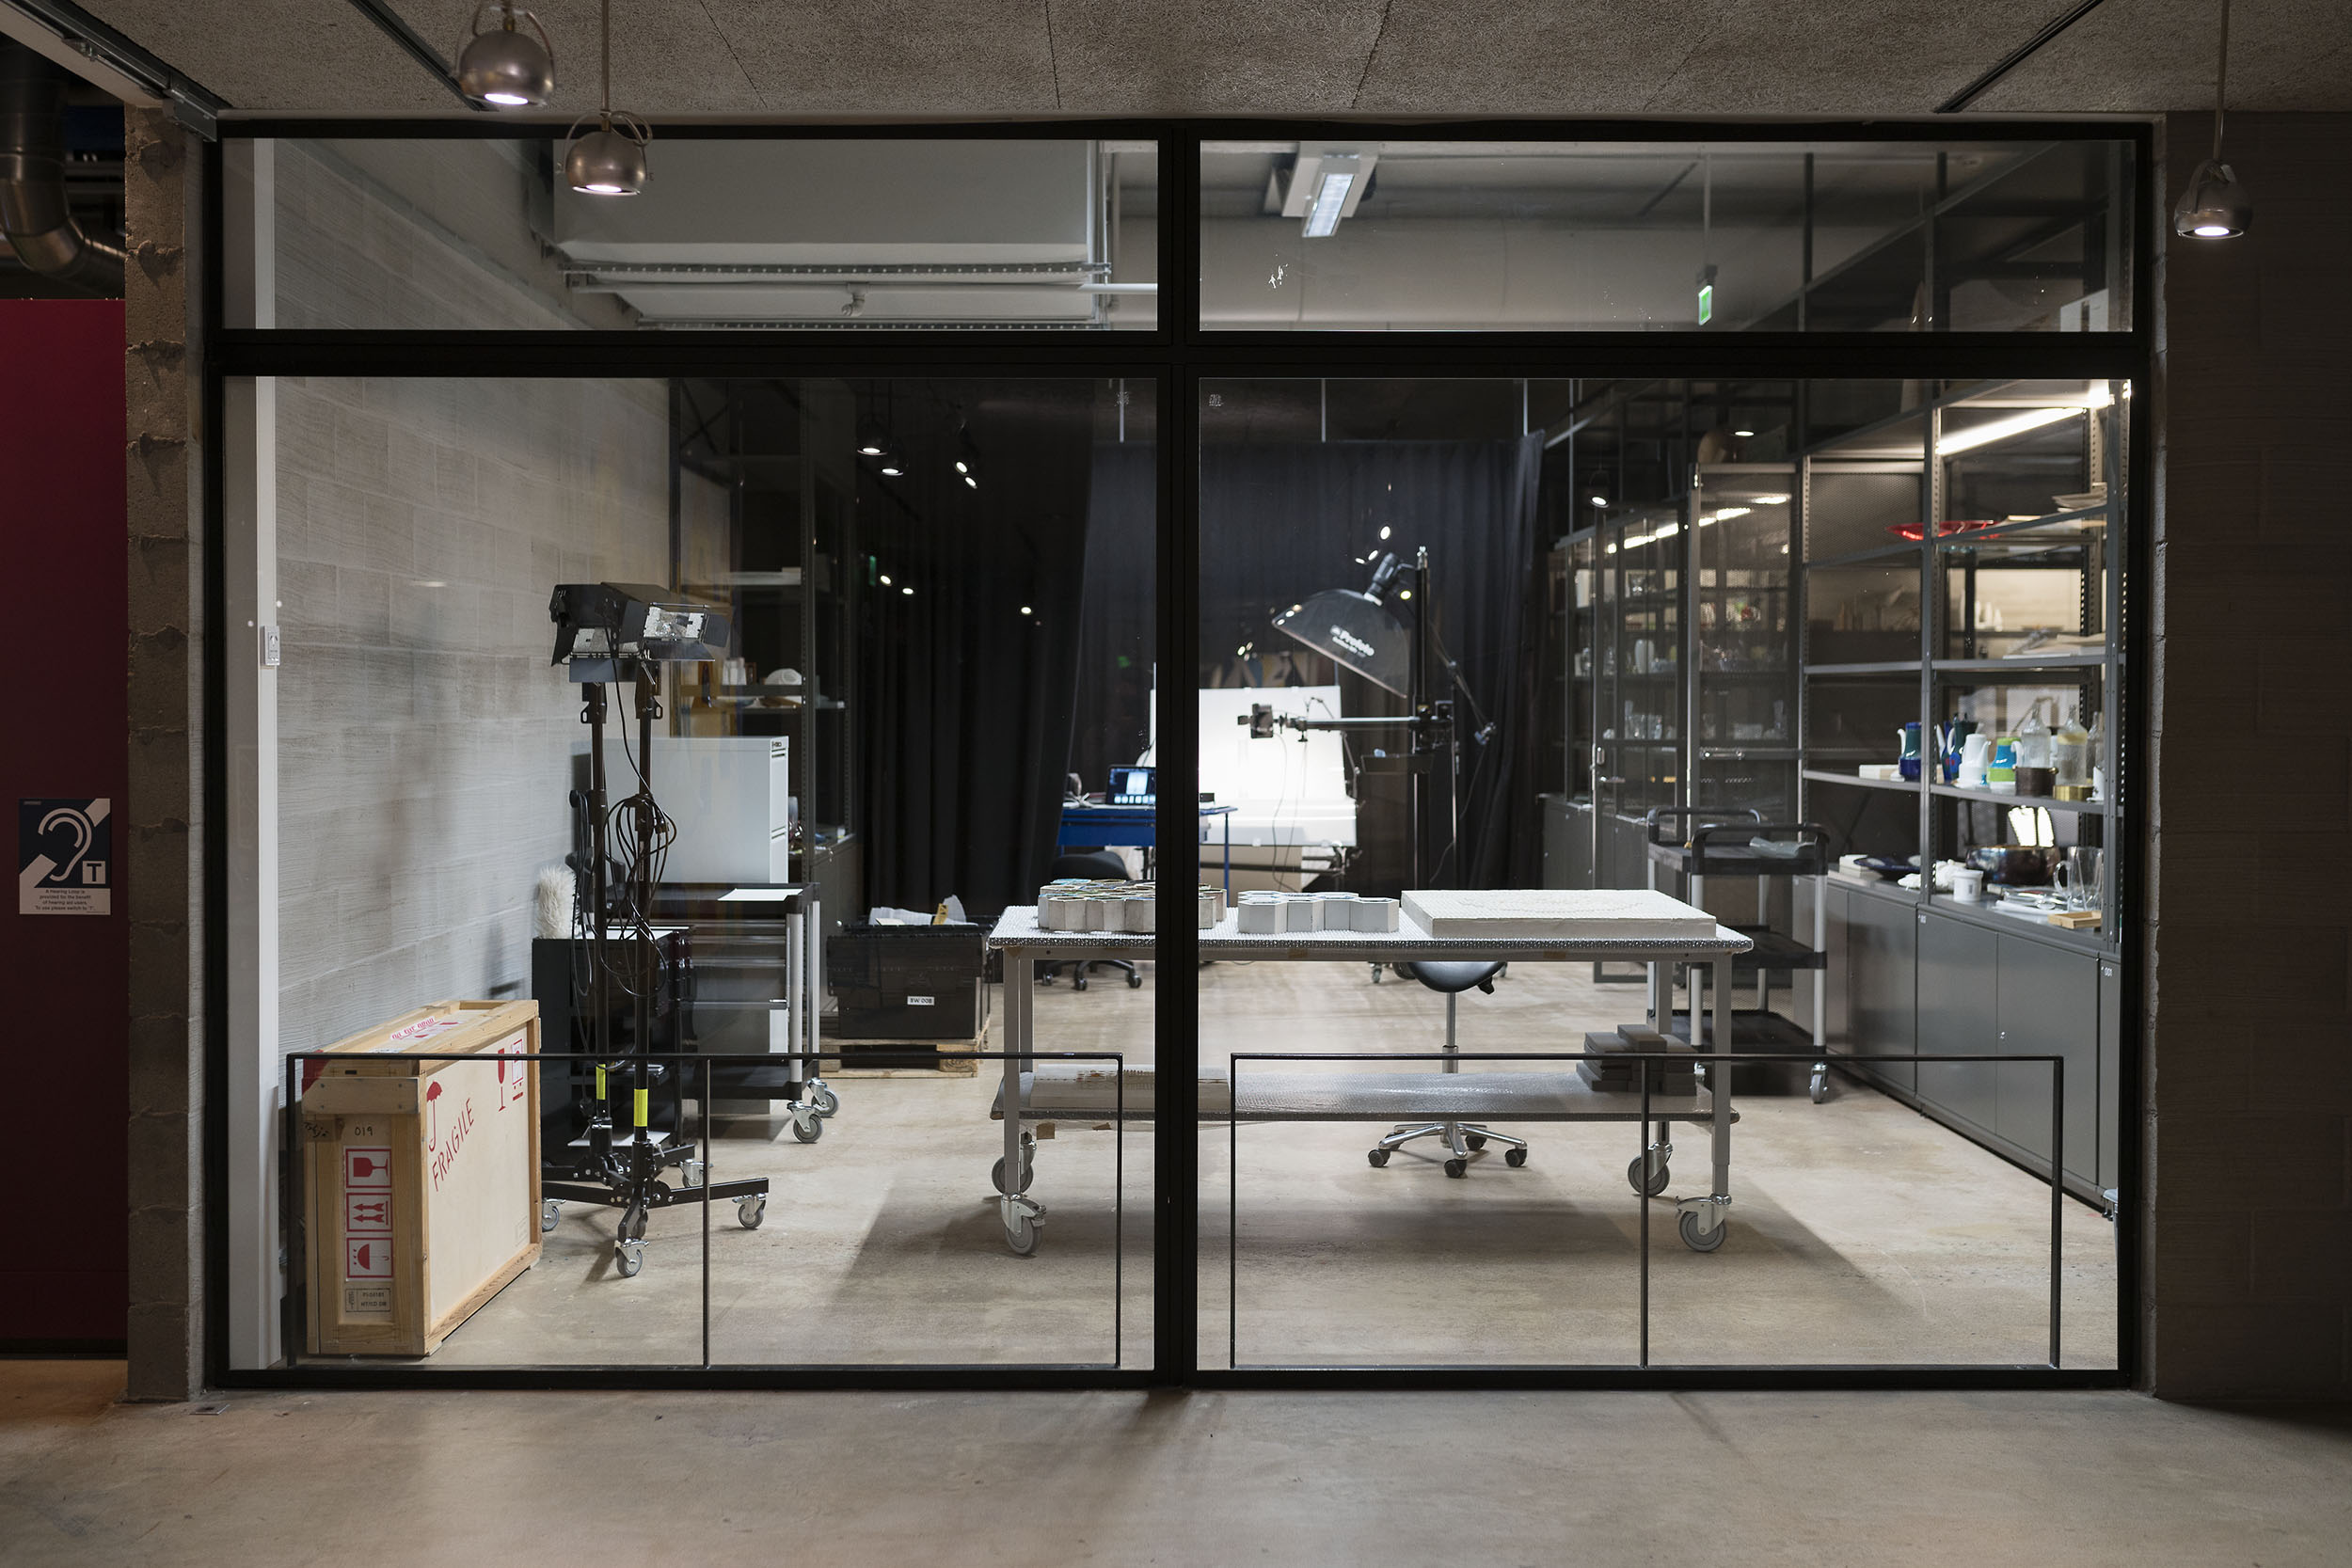 Bryk & Wirkkala: Visible Storage exhibition at EMMA